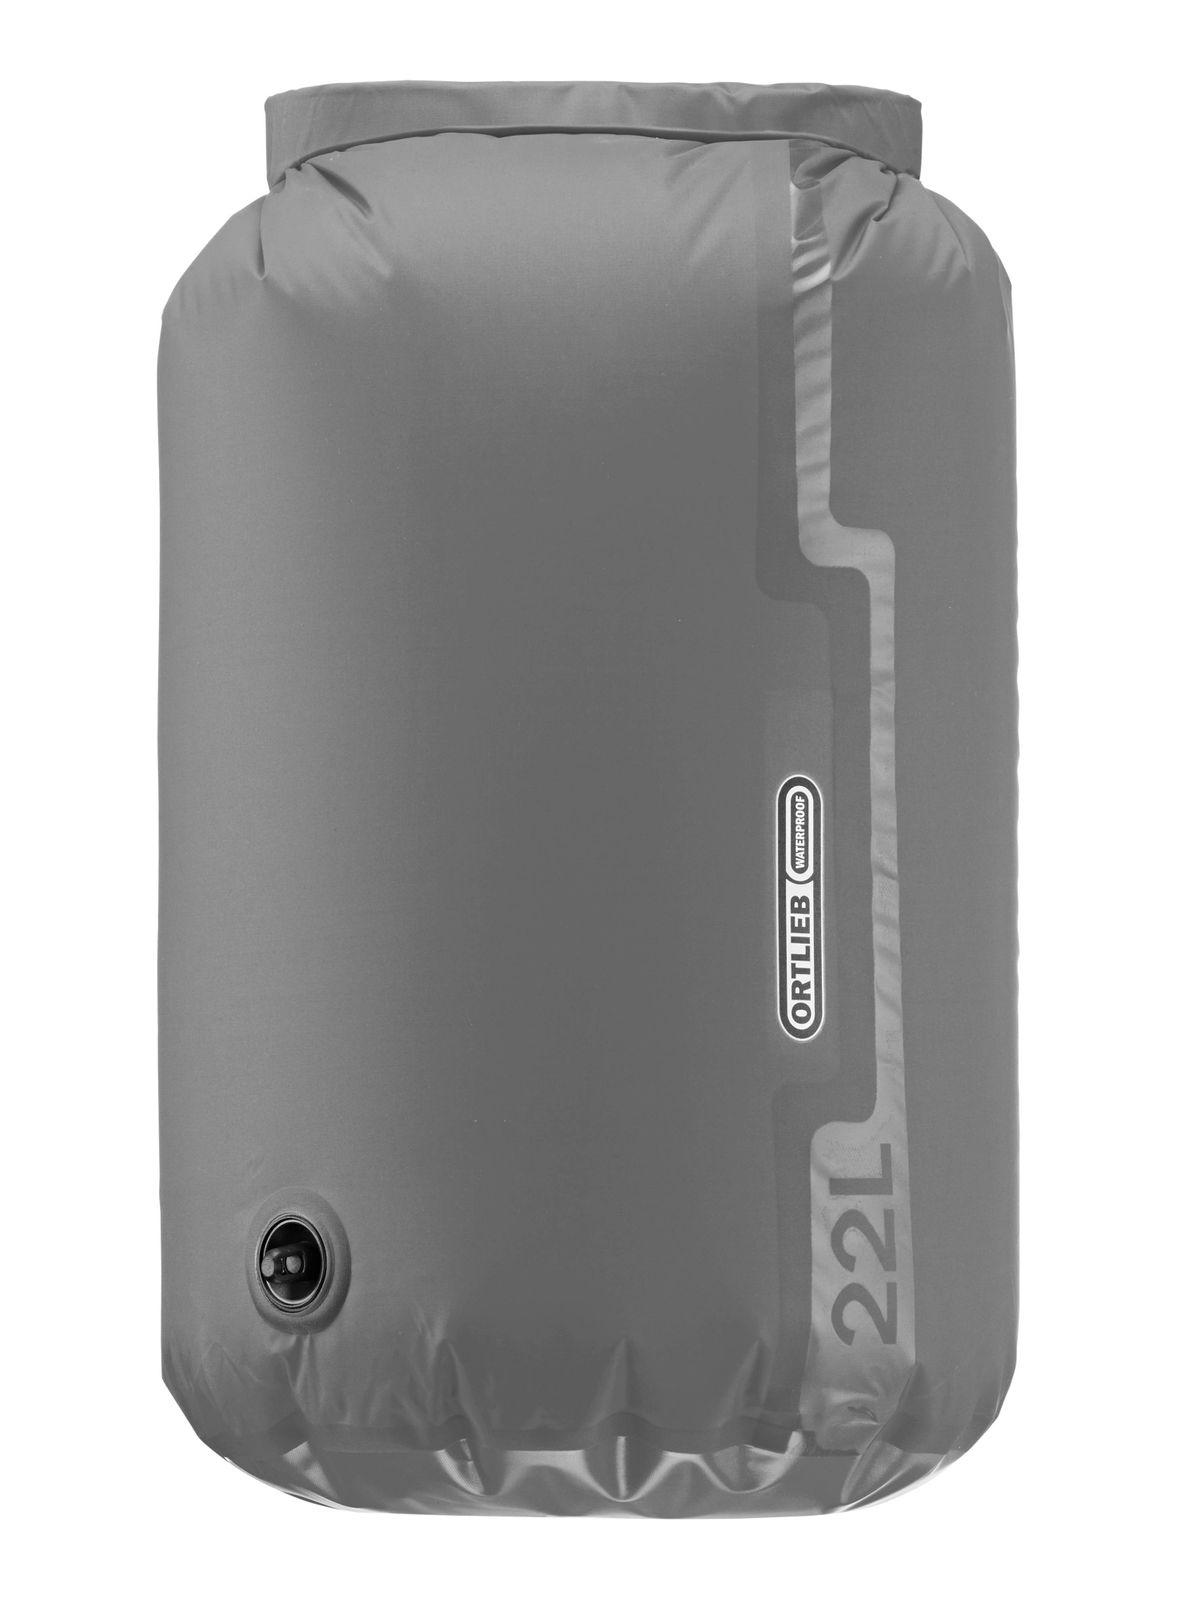 ORTLIEB Dry-Bag PS10 Valve 22L Light Grey